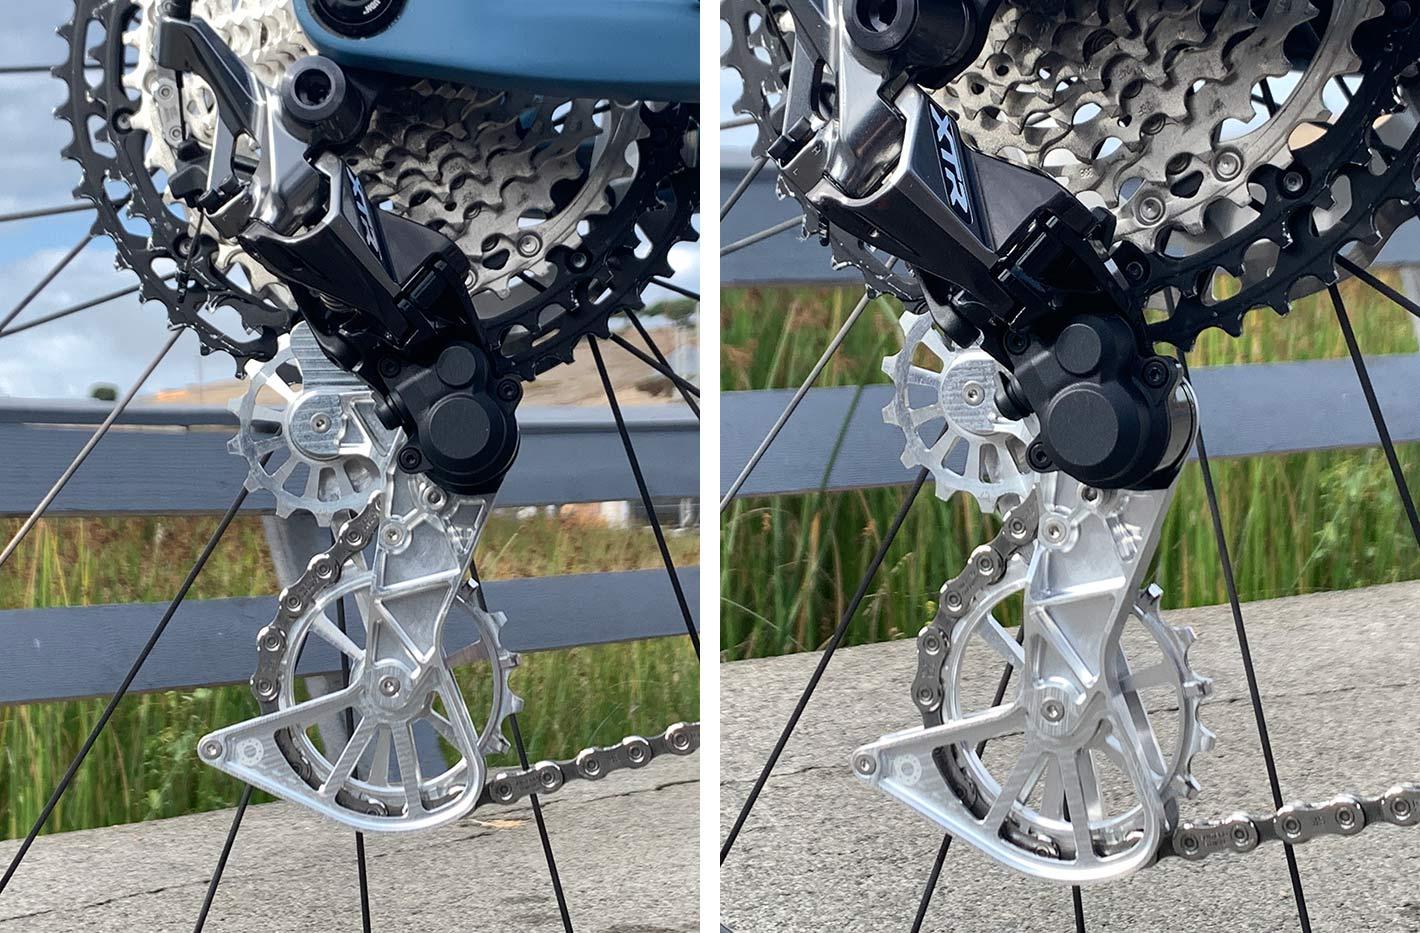 kogel oversized ceramic bearing pulley for shimano 12-speed mountain bike derailleurs